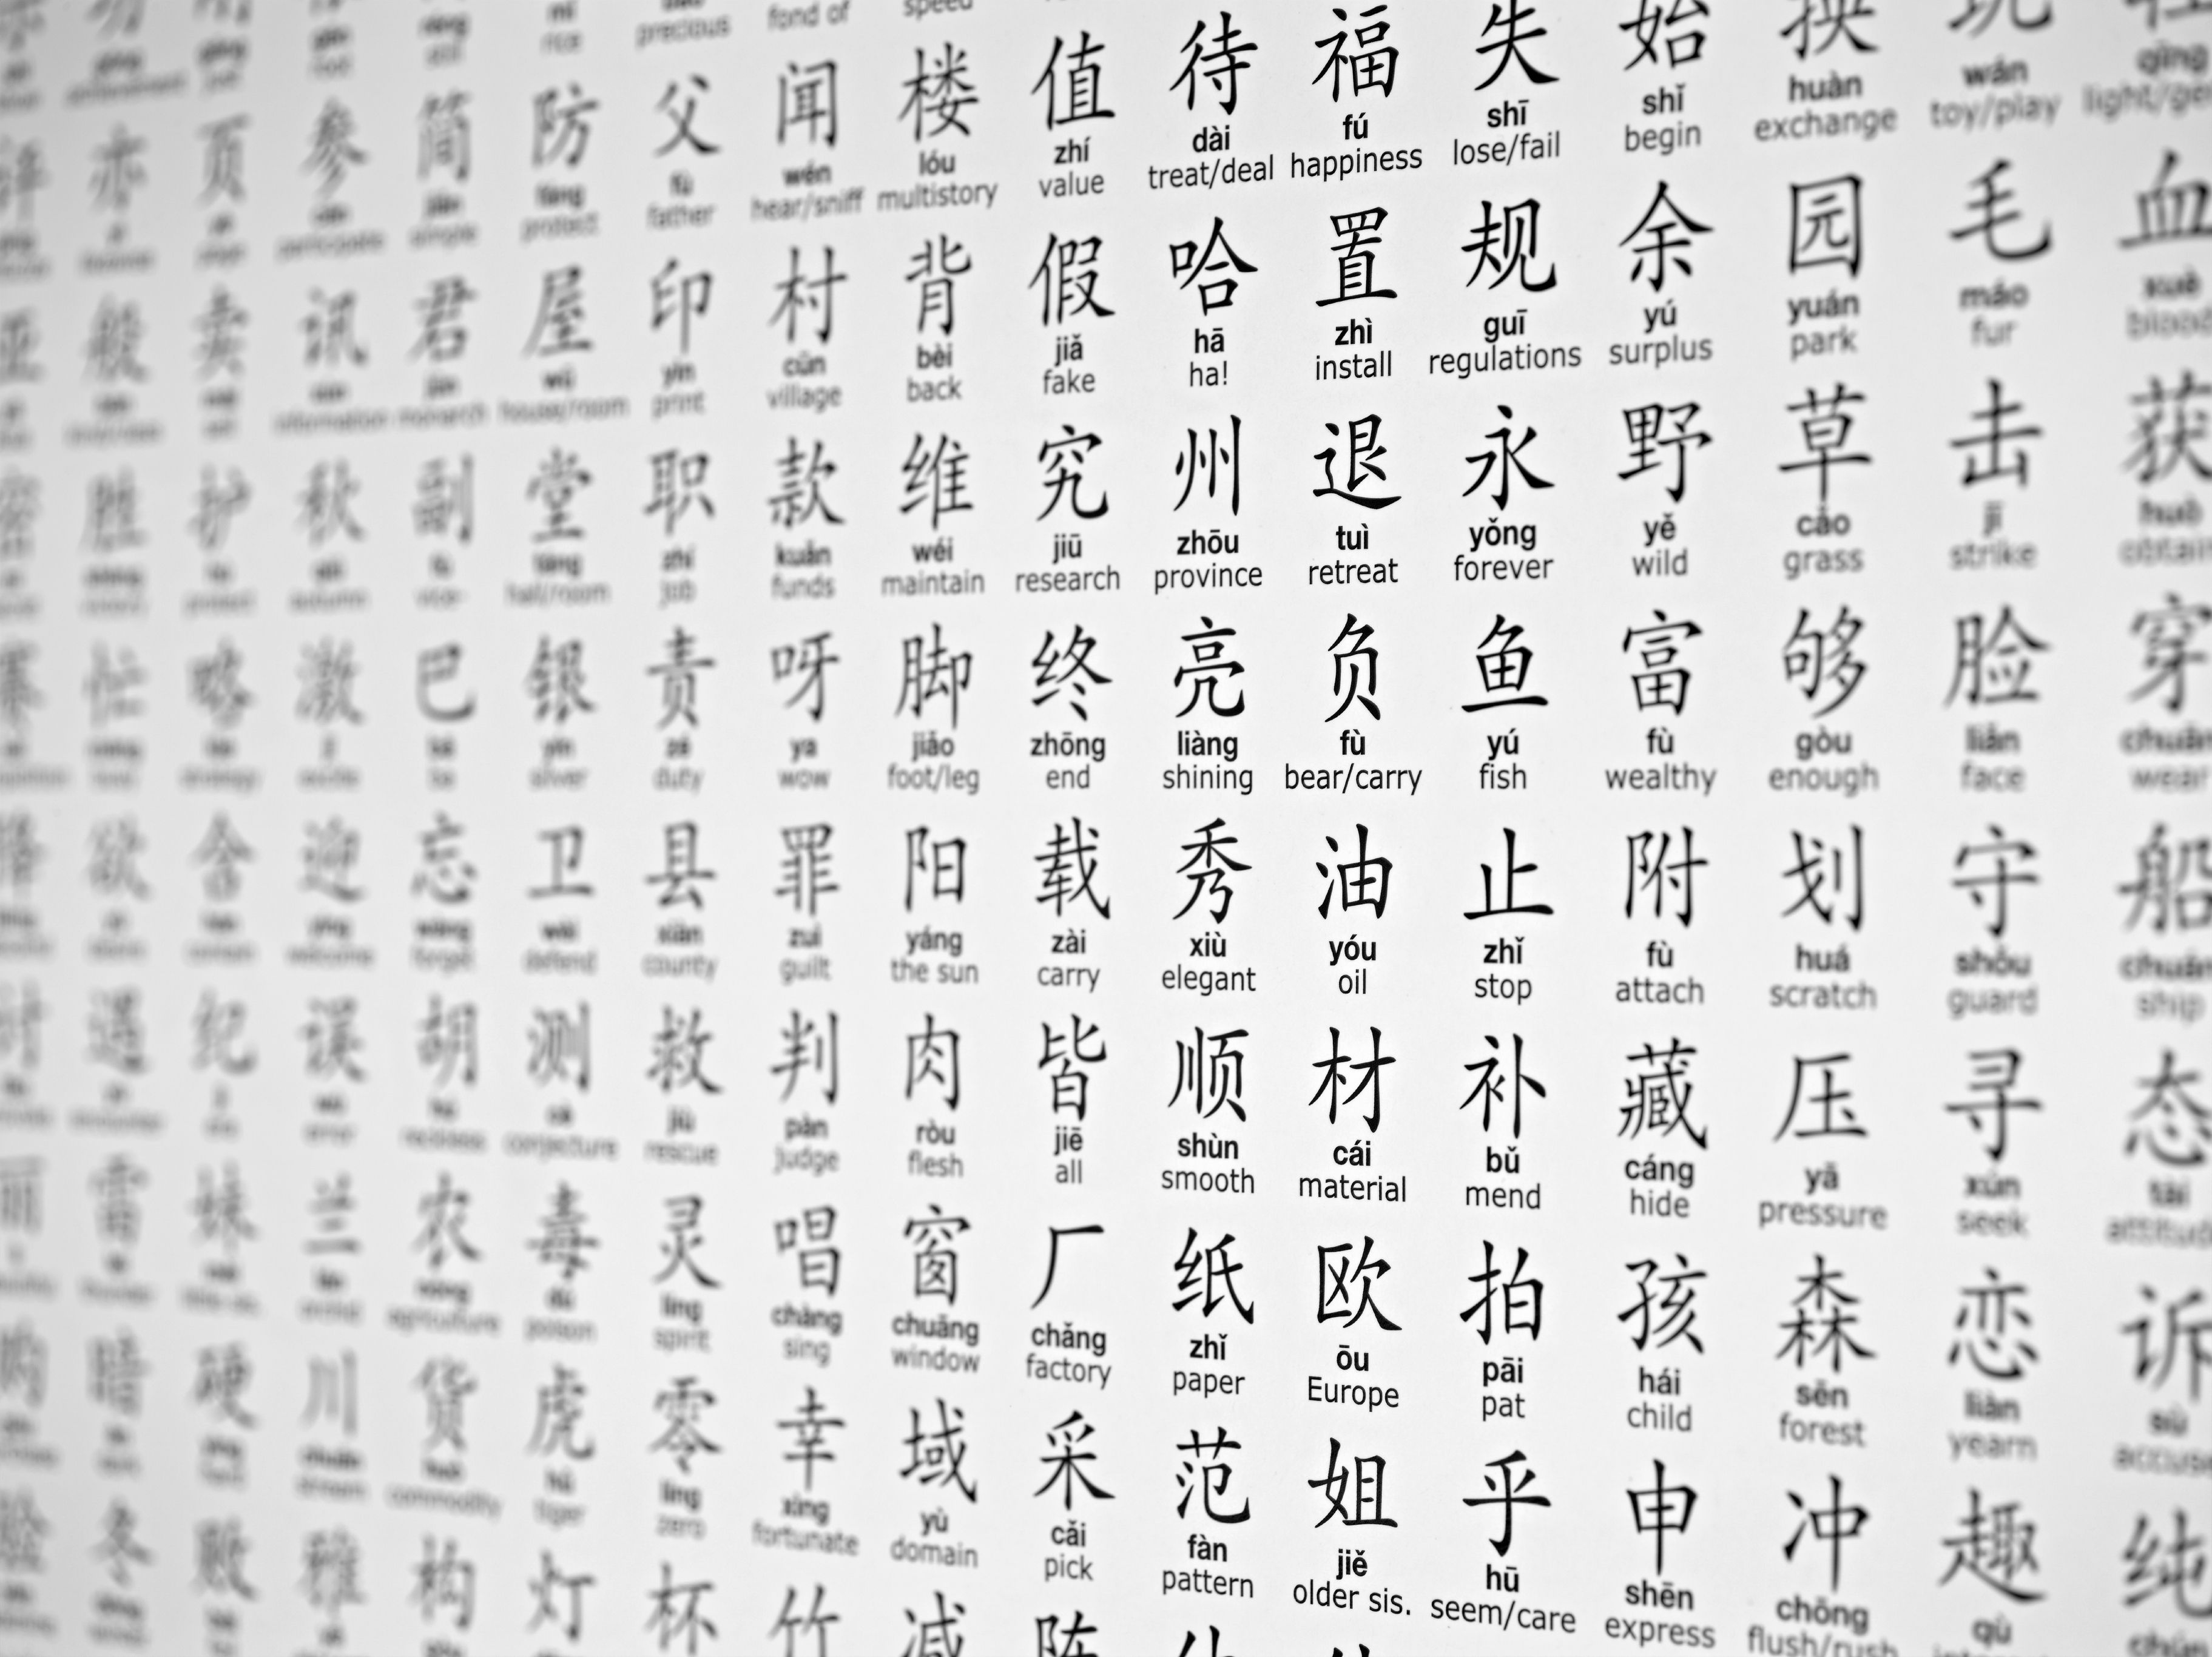 Learn Mandarin Chinese With Pinyin Romanization